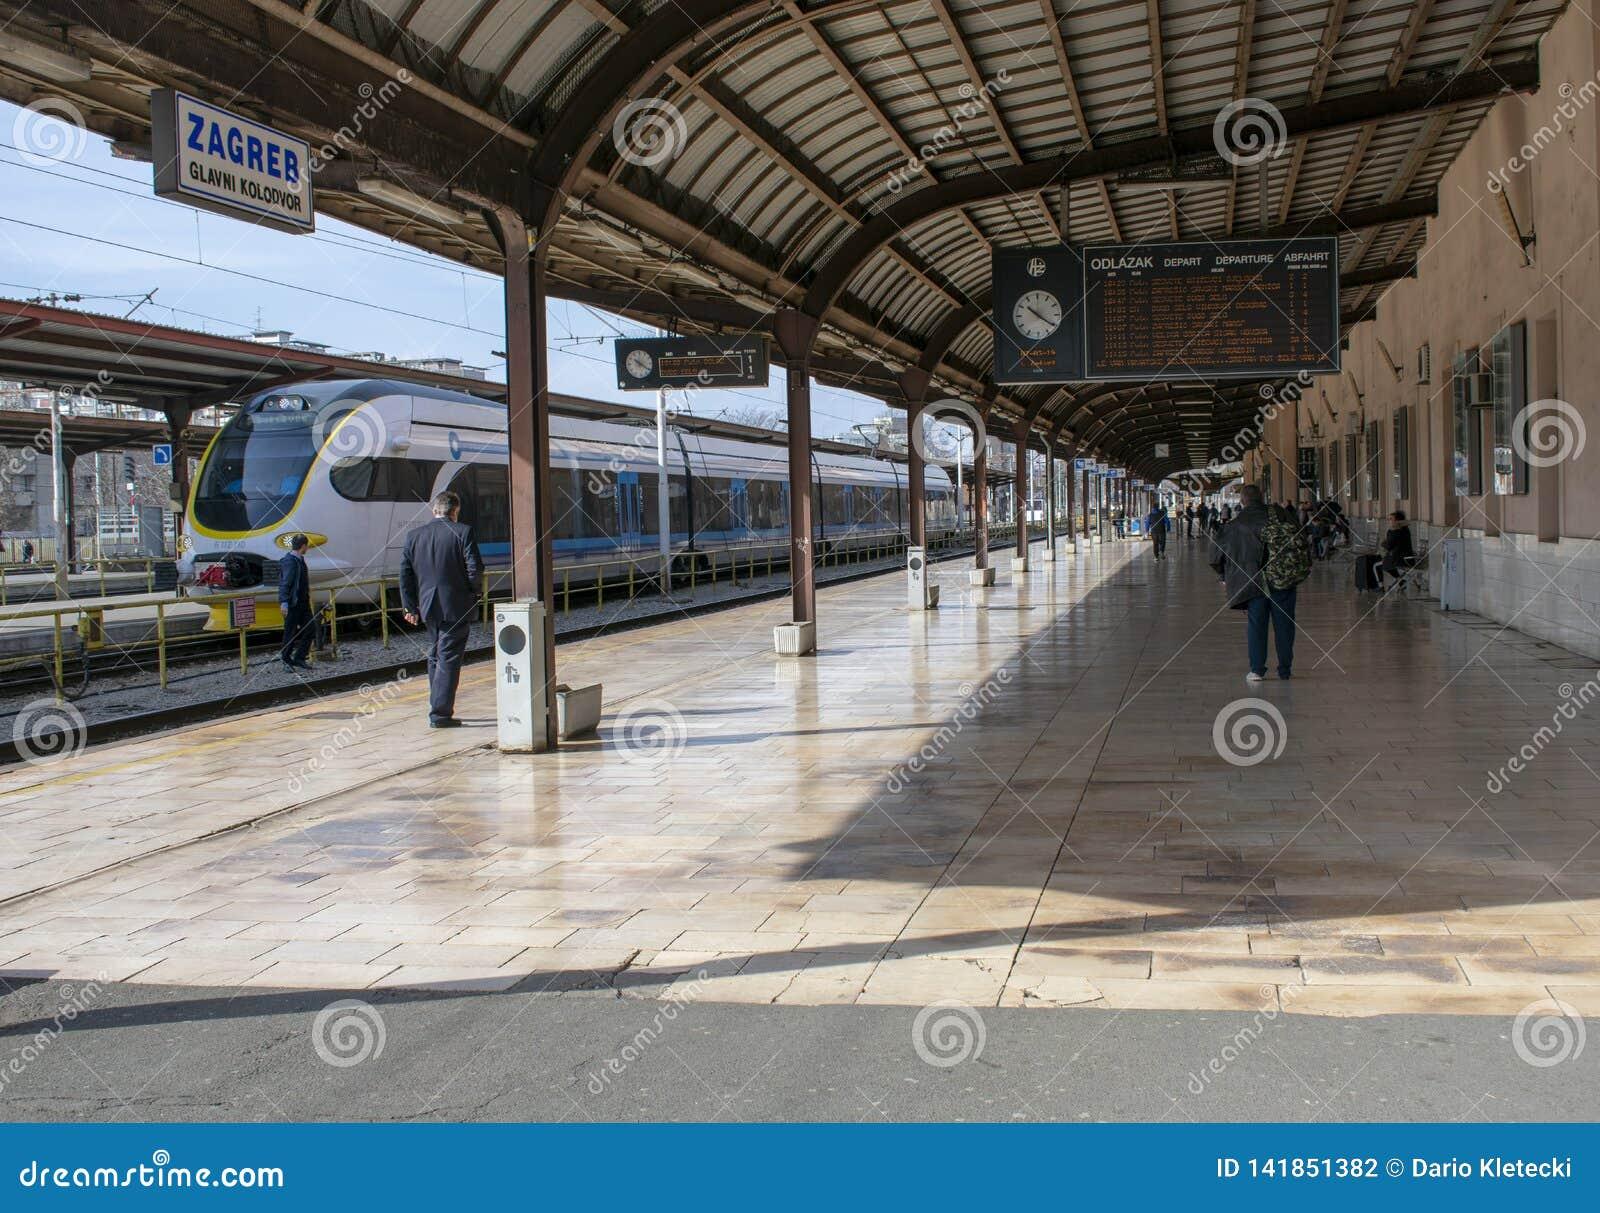 Main train station in Zagreb, Croatia